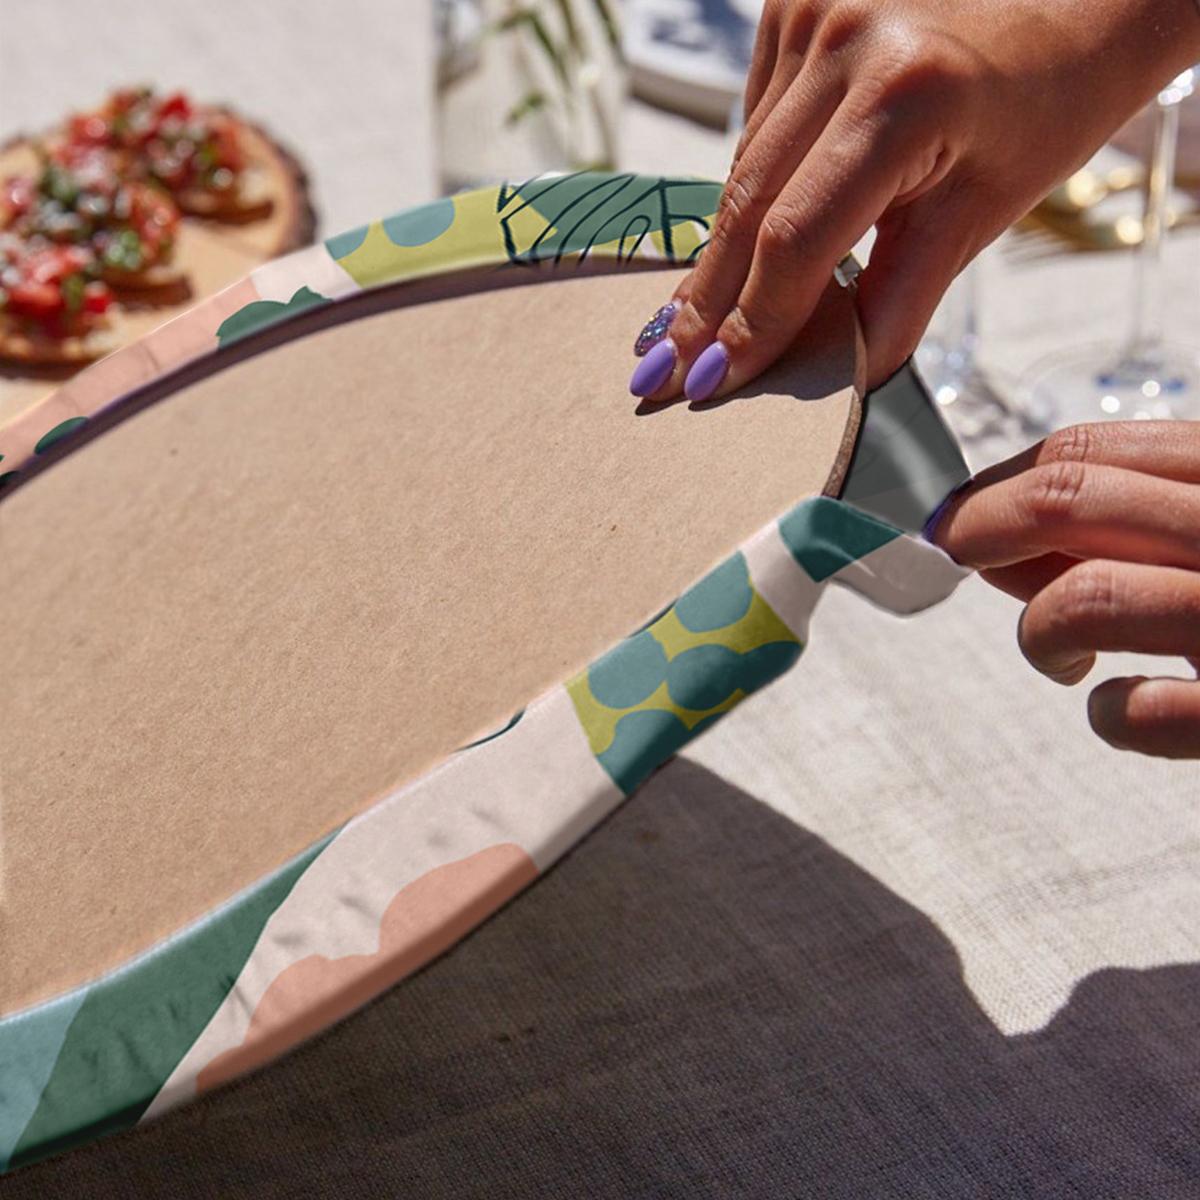 6'lı Pastel Renkli Özel Tasarım Servis Altlığı & Supla Realhomes